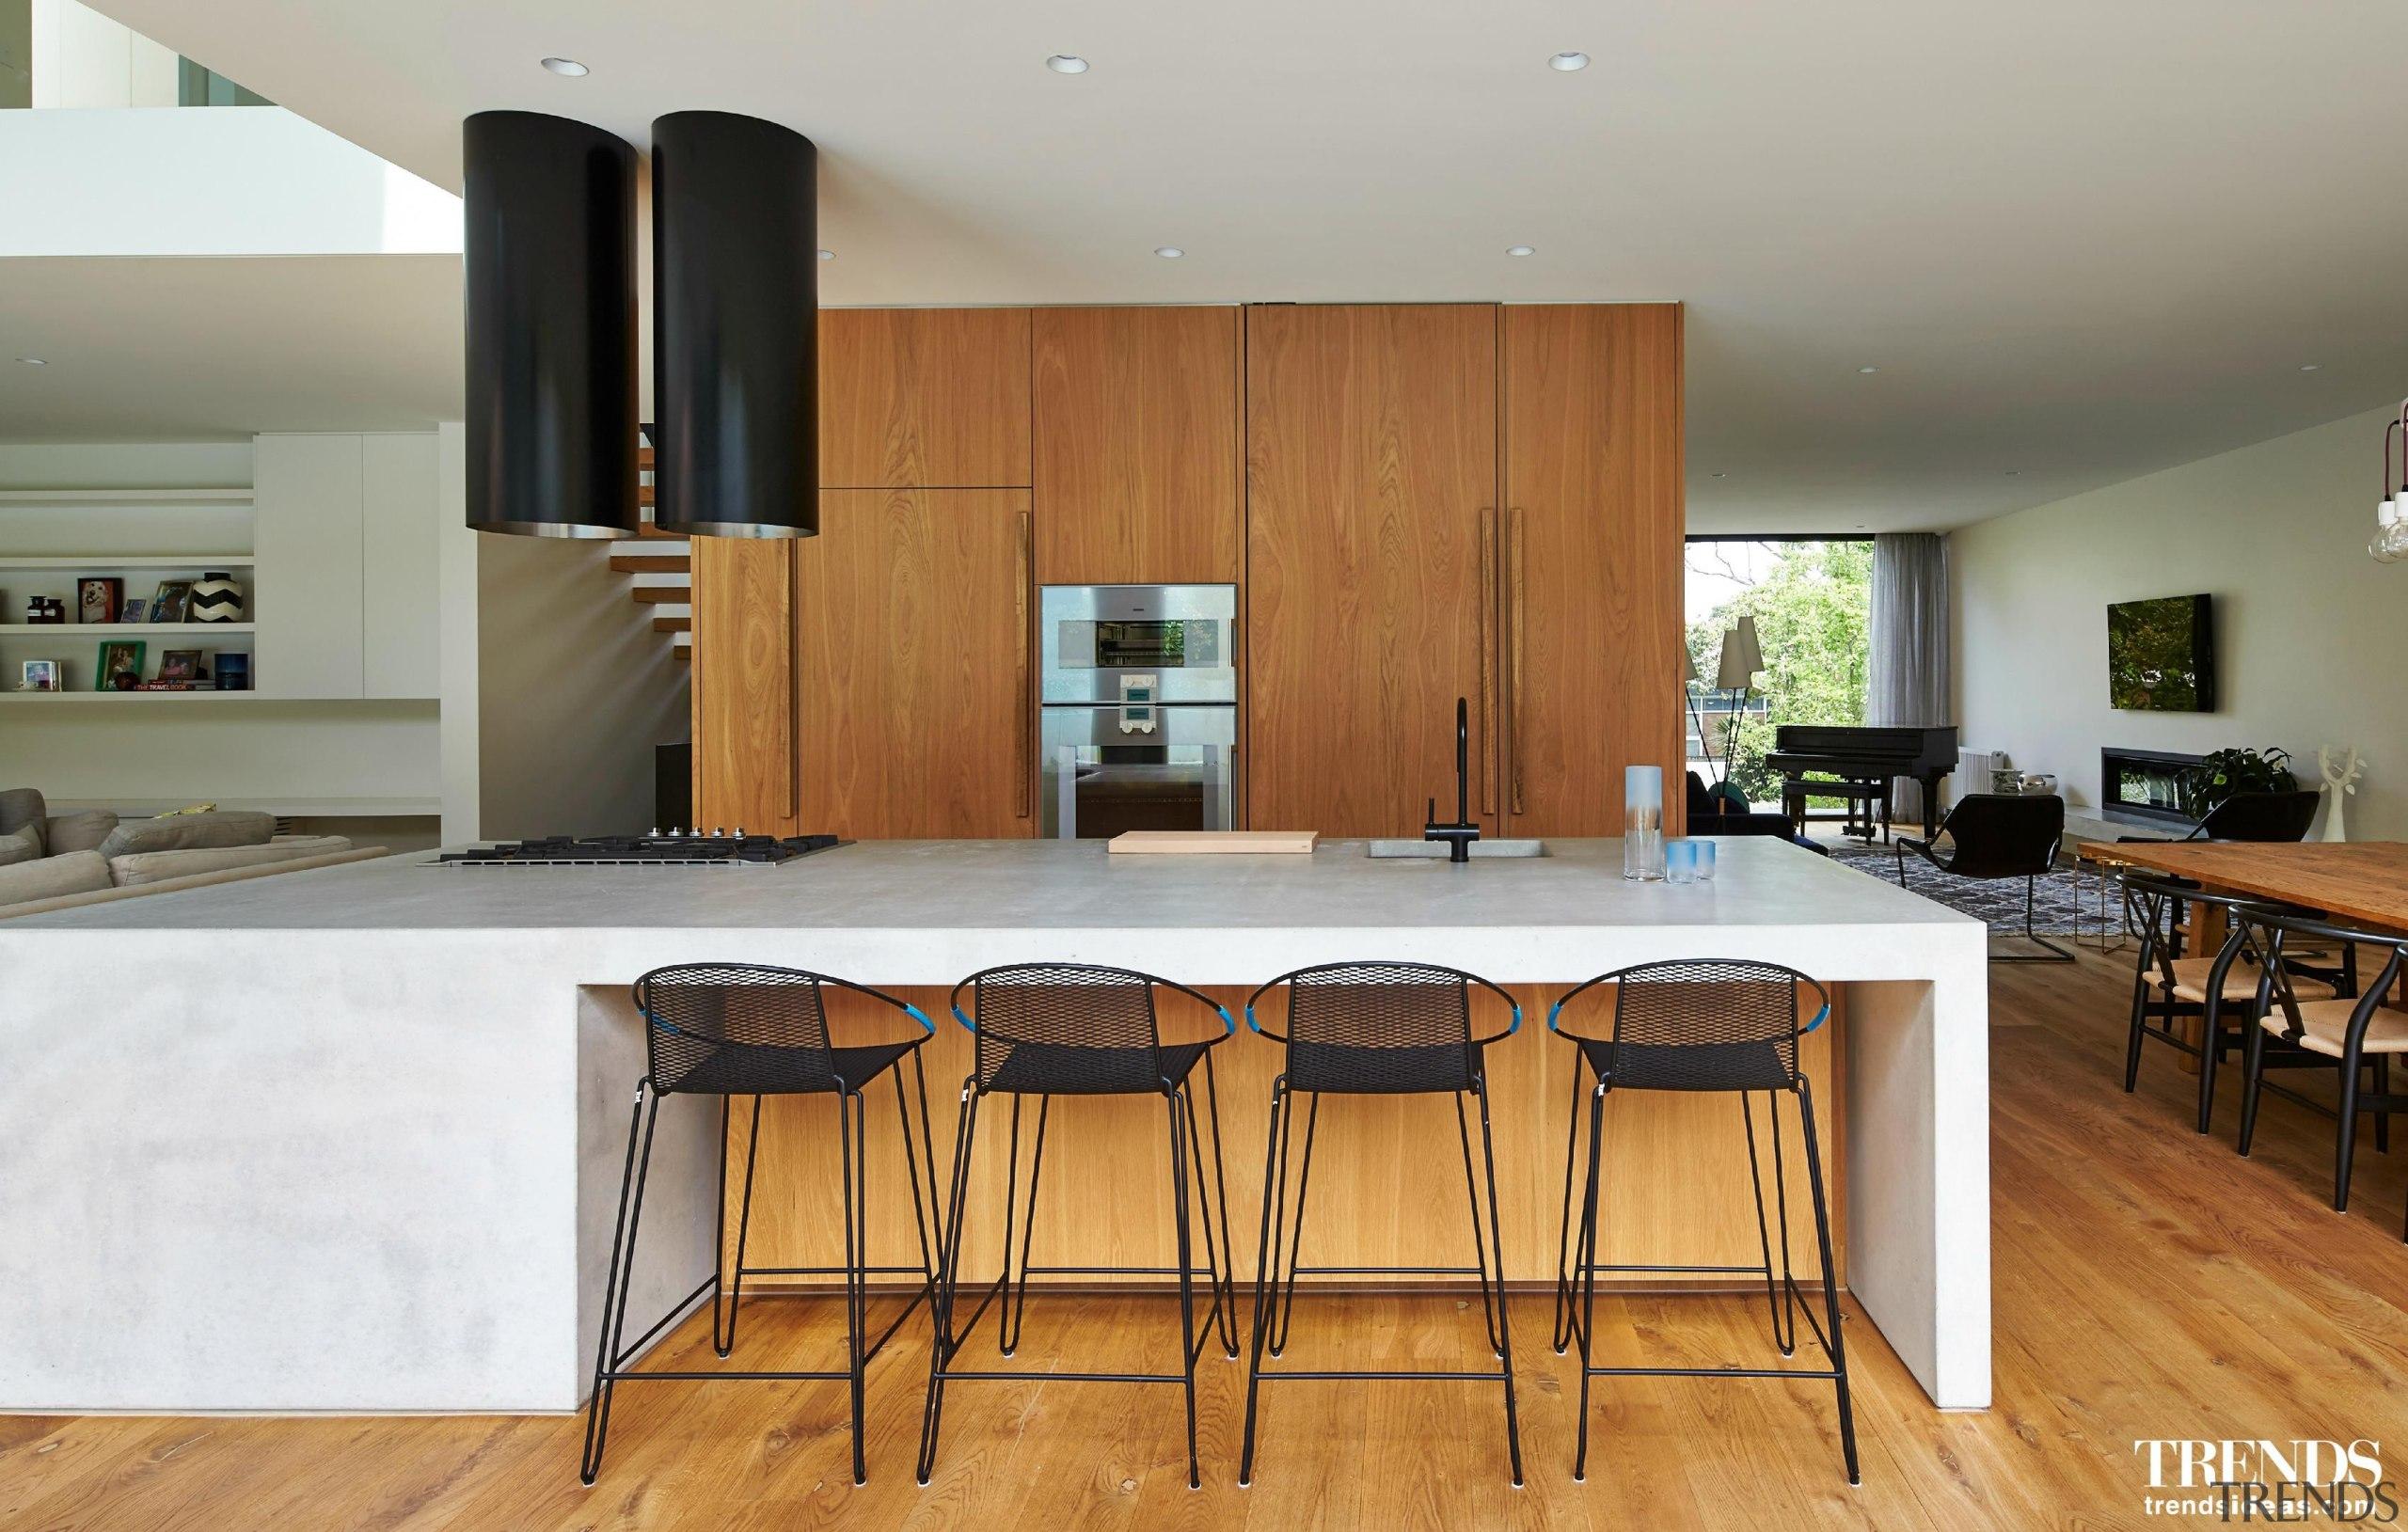 DKO Architecture - countertop | floor | flooring countertop, floor, flooring, hardwood, interior design, kitchen, property, real estate, room, table, wood, wood flooring, gray